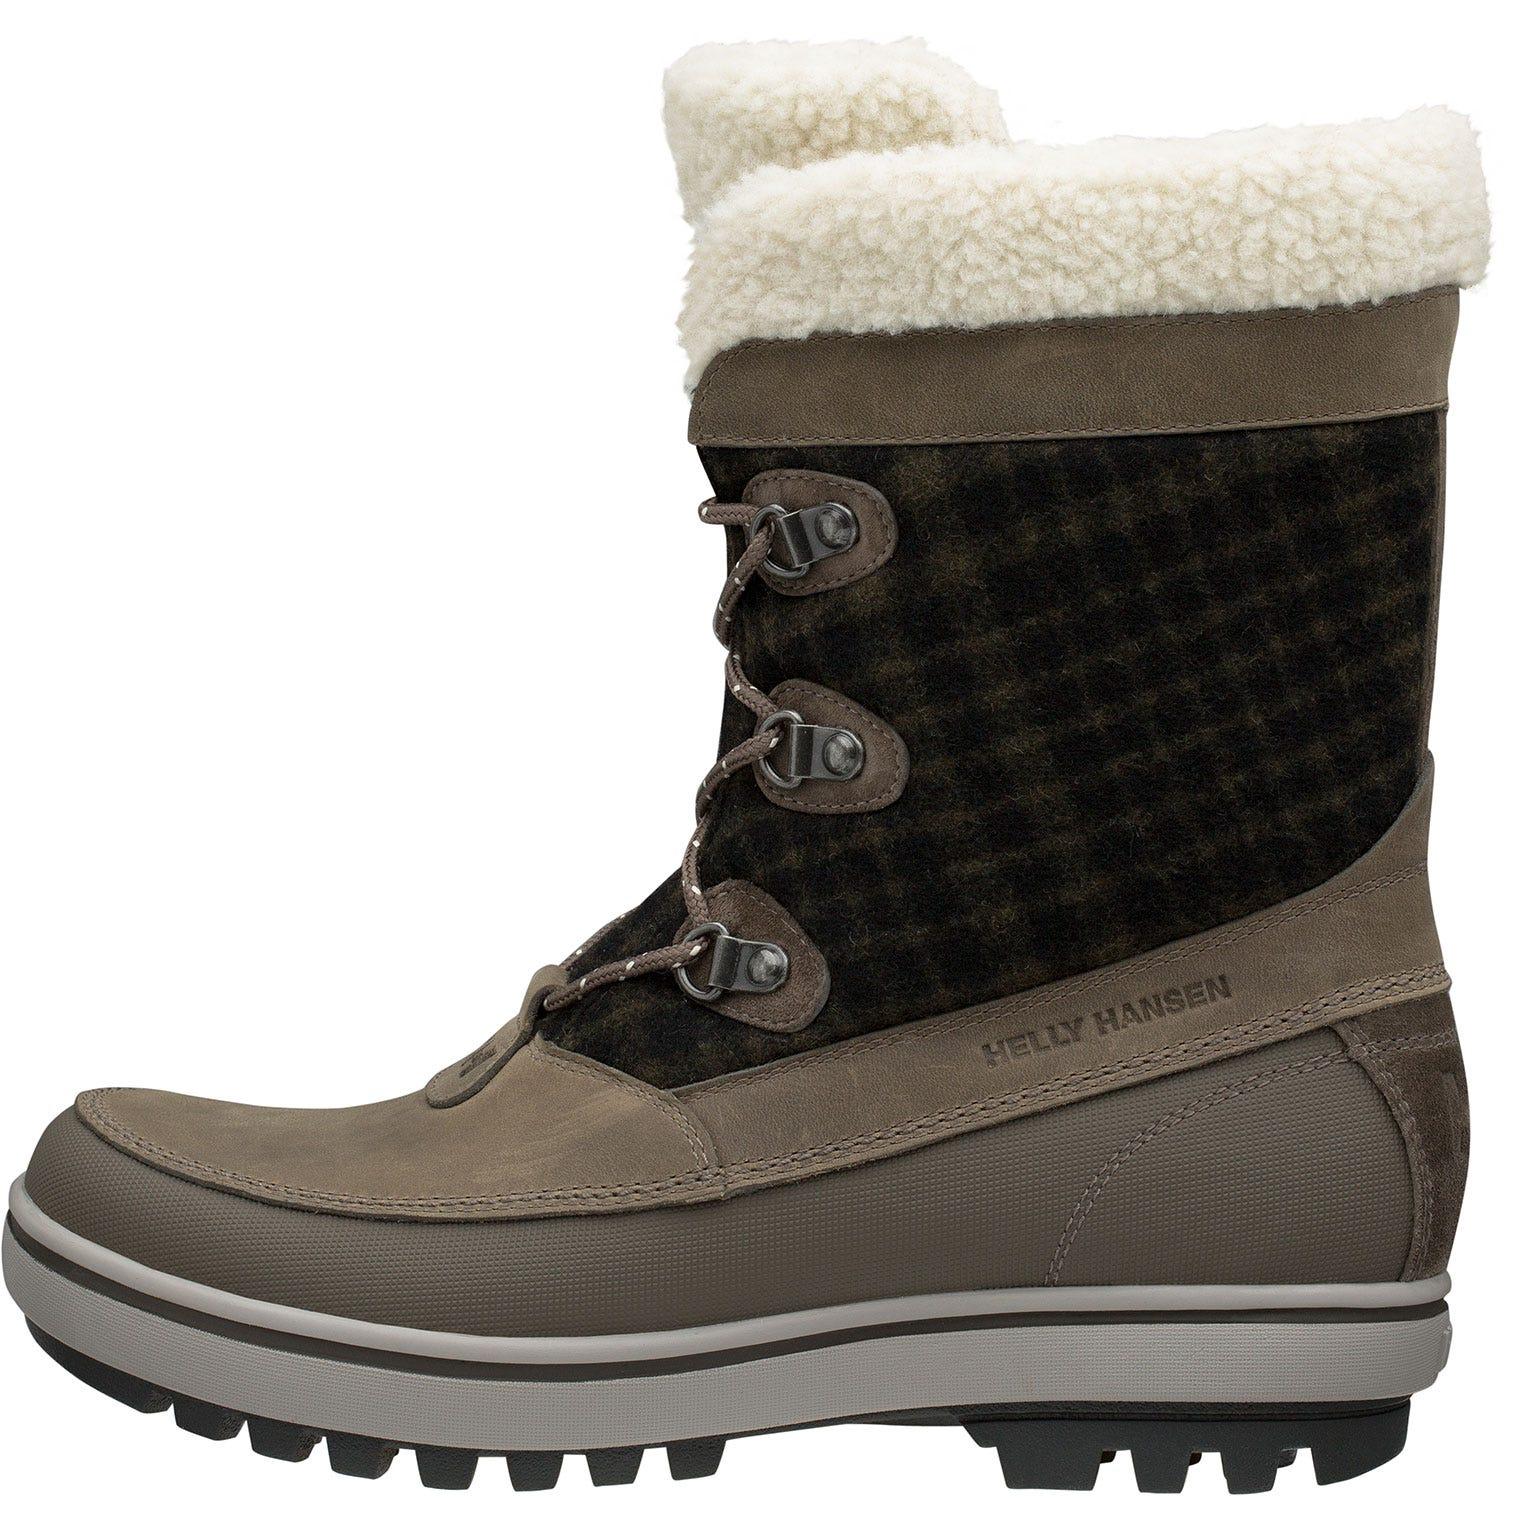 Helly Hansen W Georgina Womens Winter Boot Grey 40.5/9